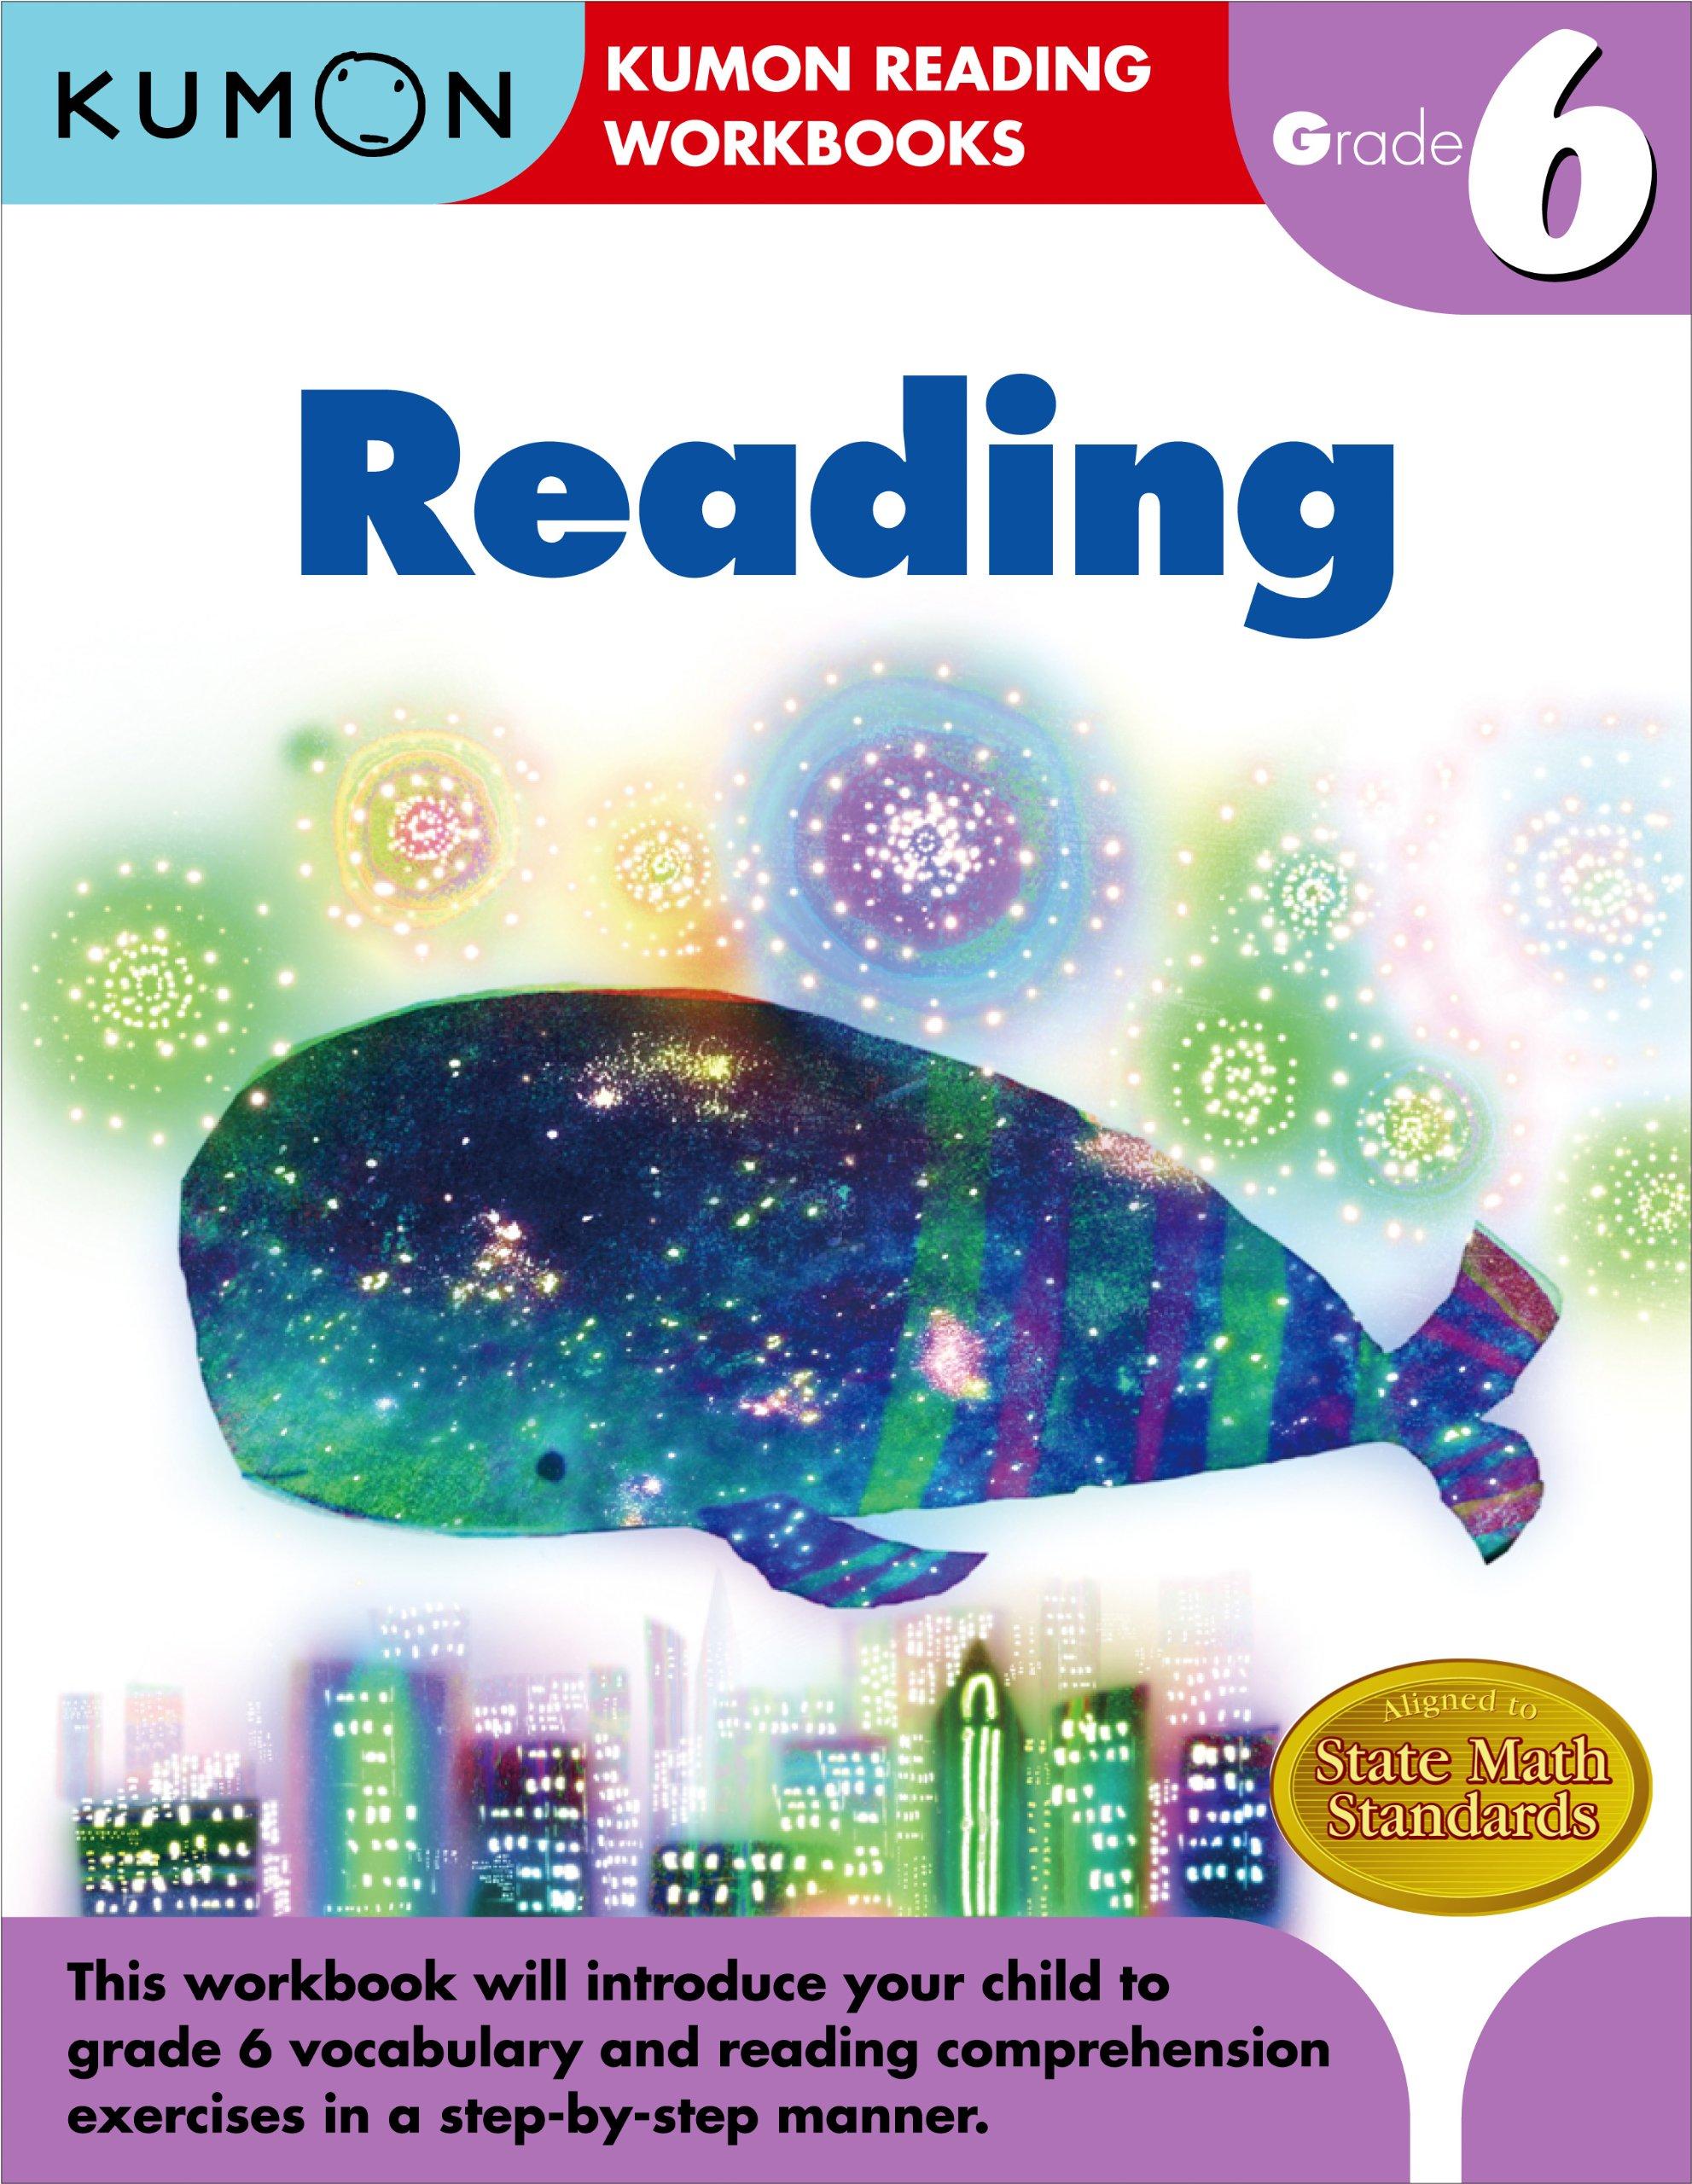 Worksheets Kumon Reading Worksheets kumon publishing reading workbooks grade 1 reading